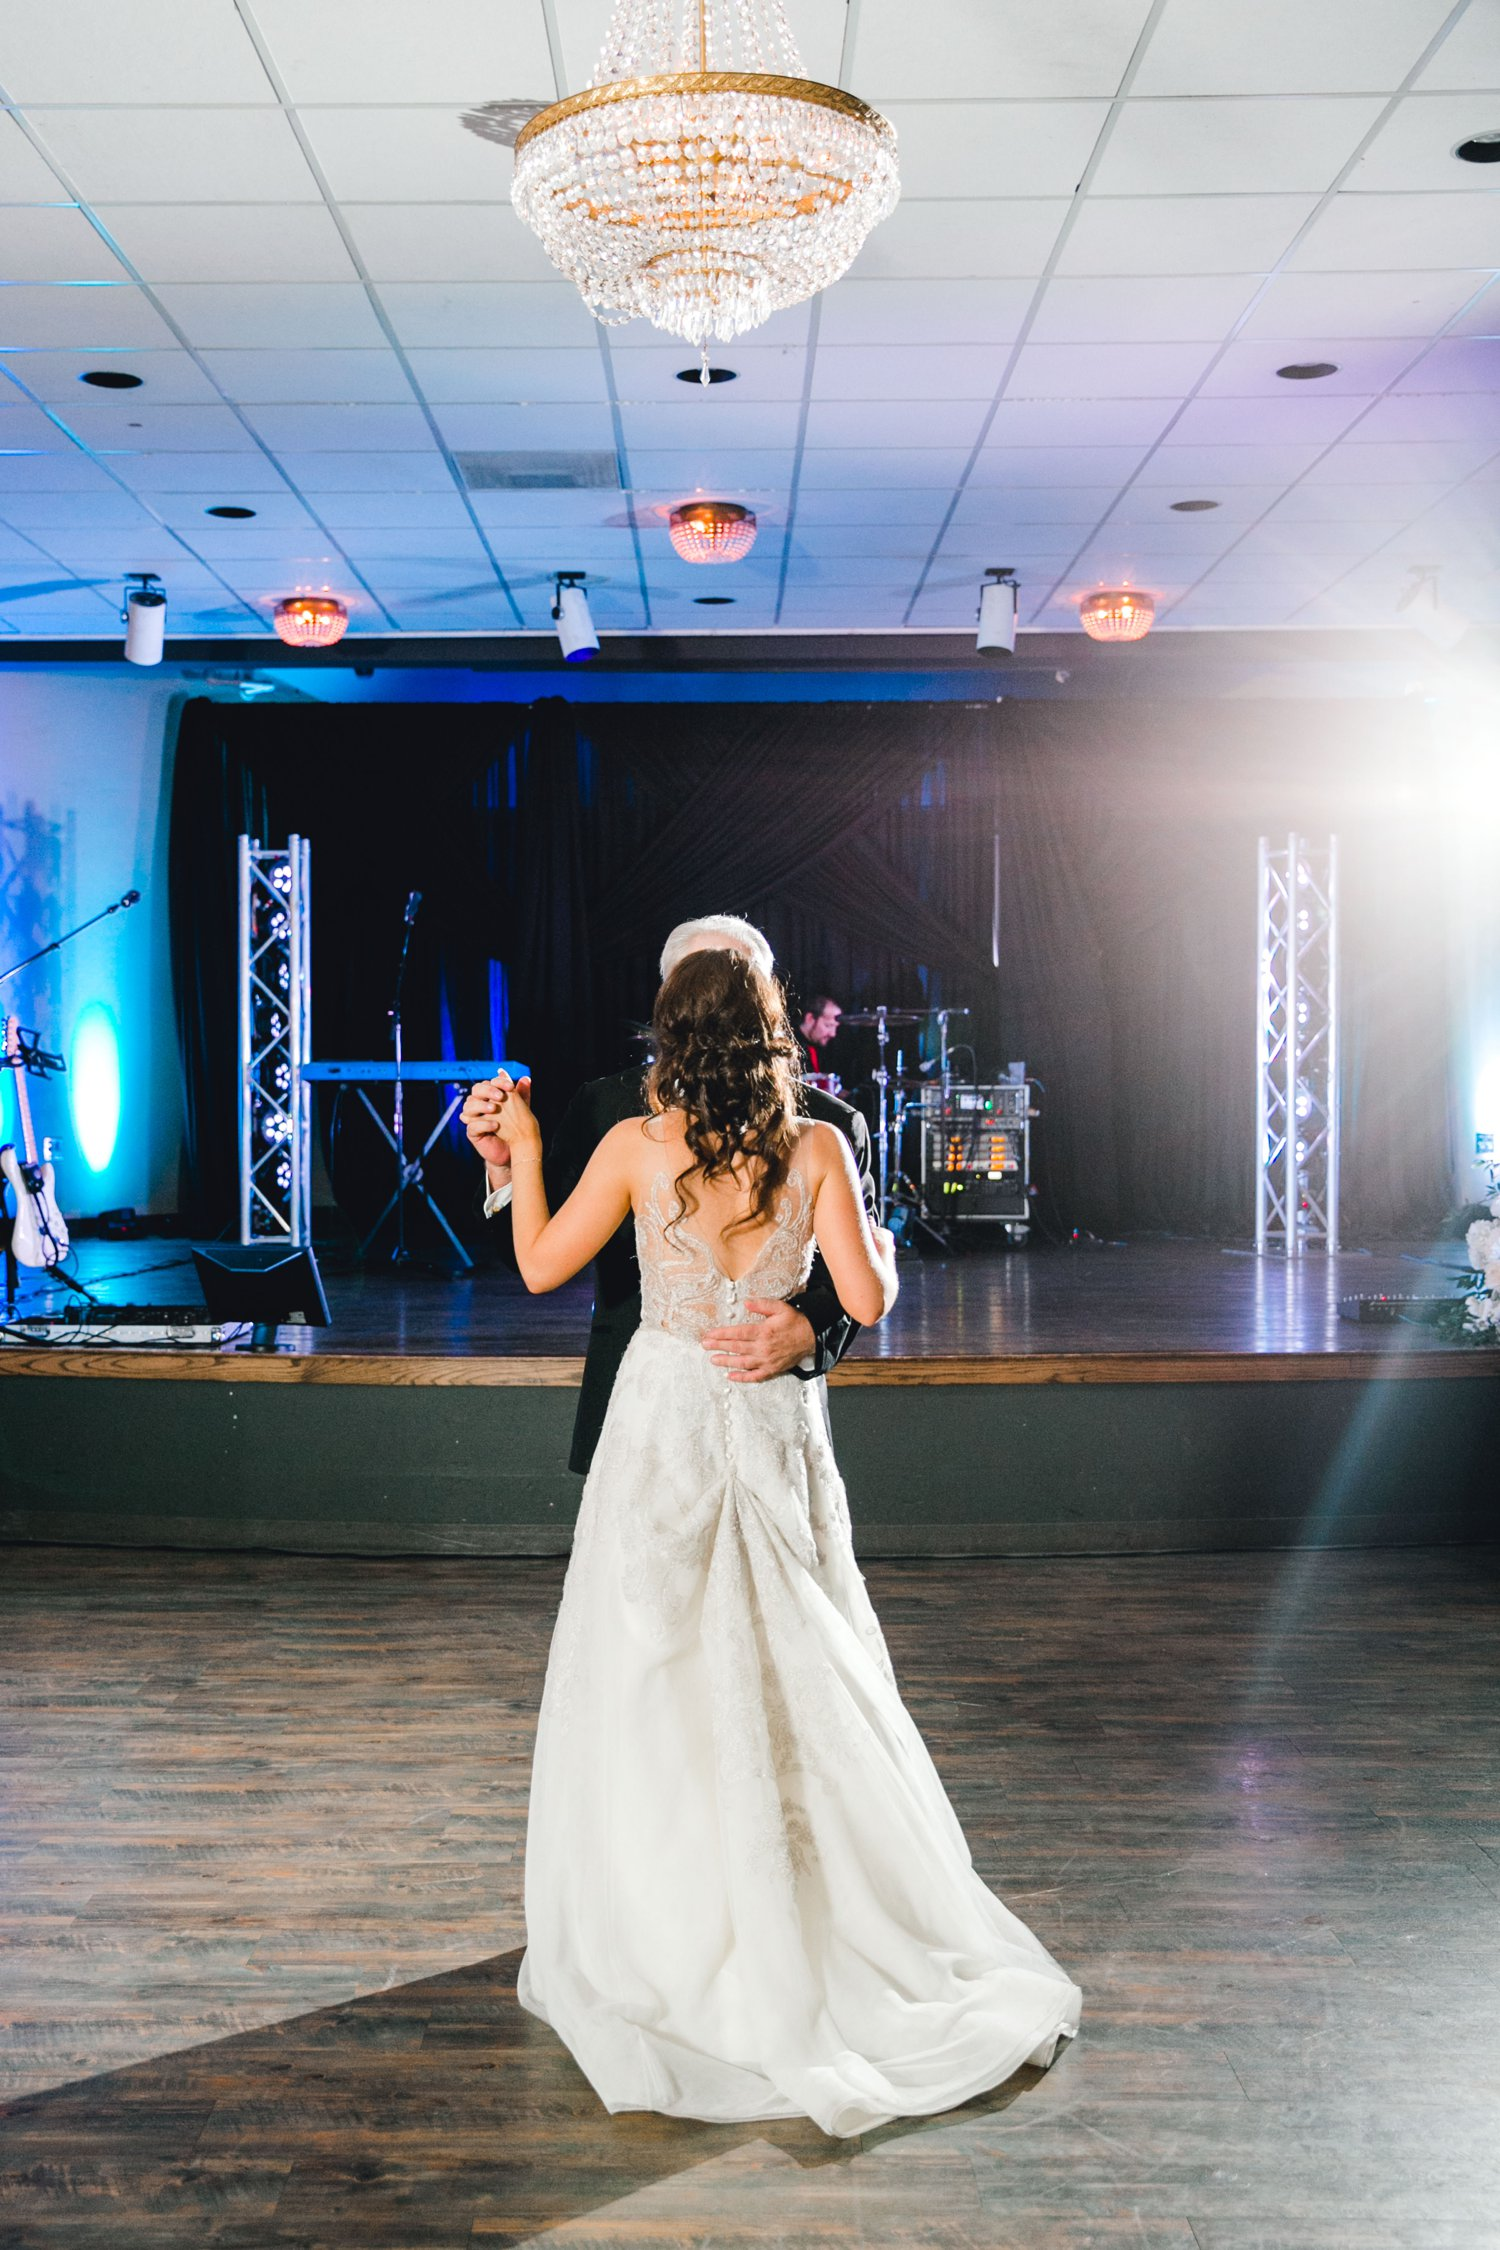 Hunter_and_Molly_Rawls_ALLEEJ_Lubbock_WEDDING_Legacy_Event_Center_0172.jpg